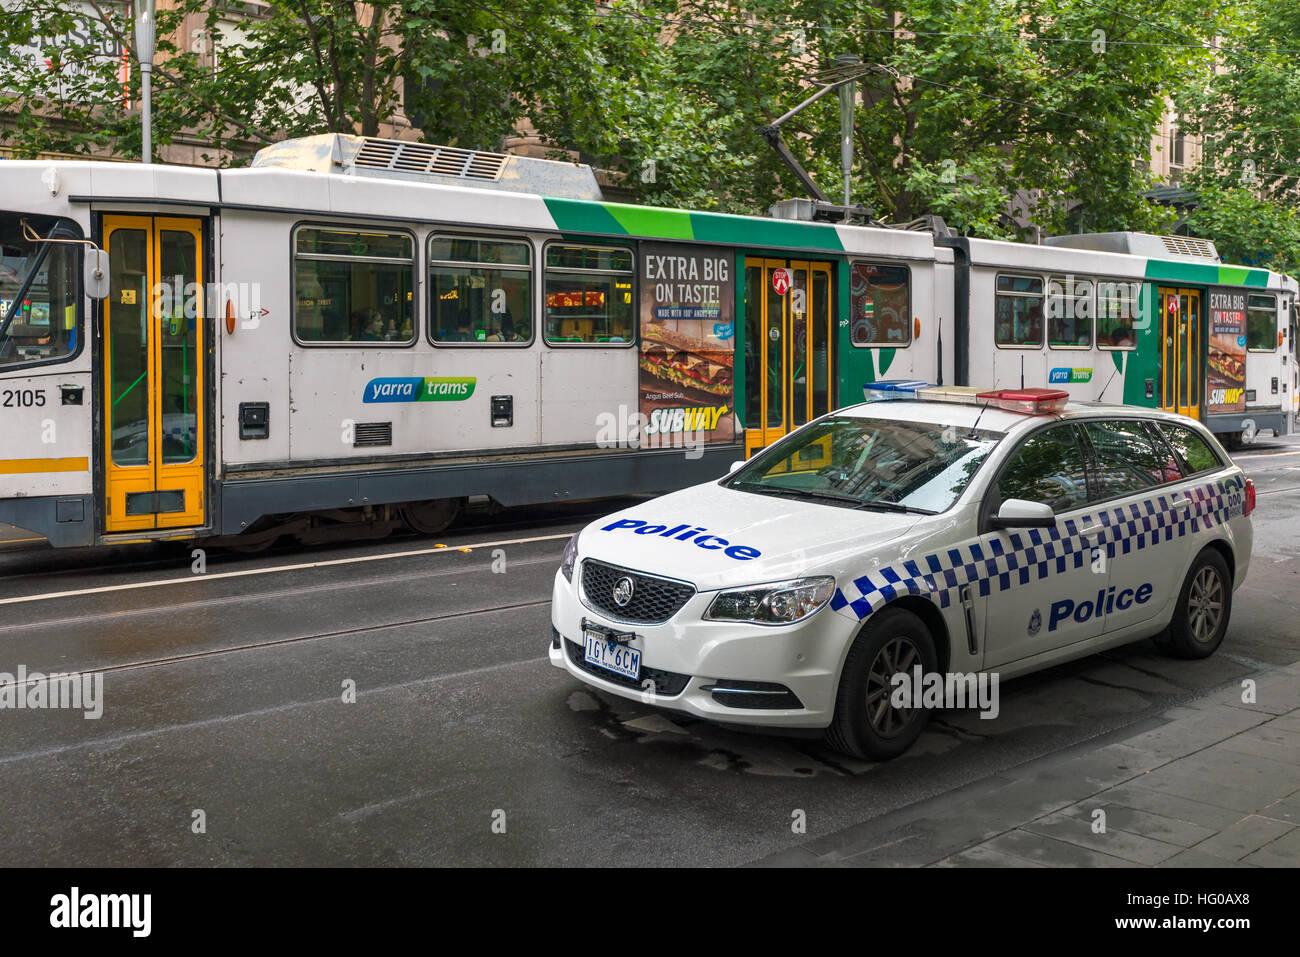 Melbourne, Australia - December 27, 2016: Holden police car parked in Melbourne CBD area. - Stock Image